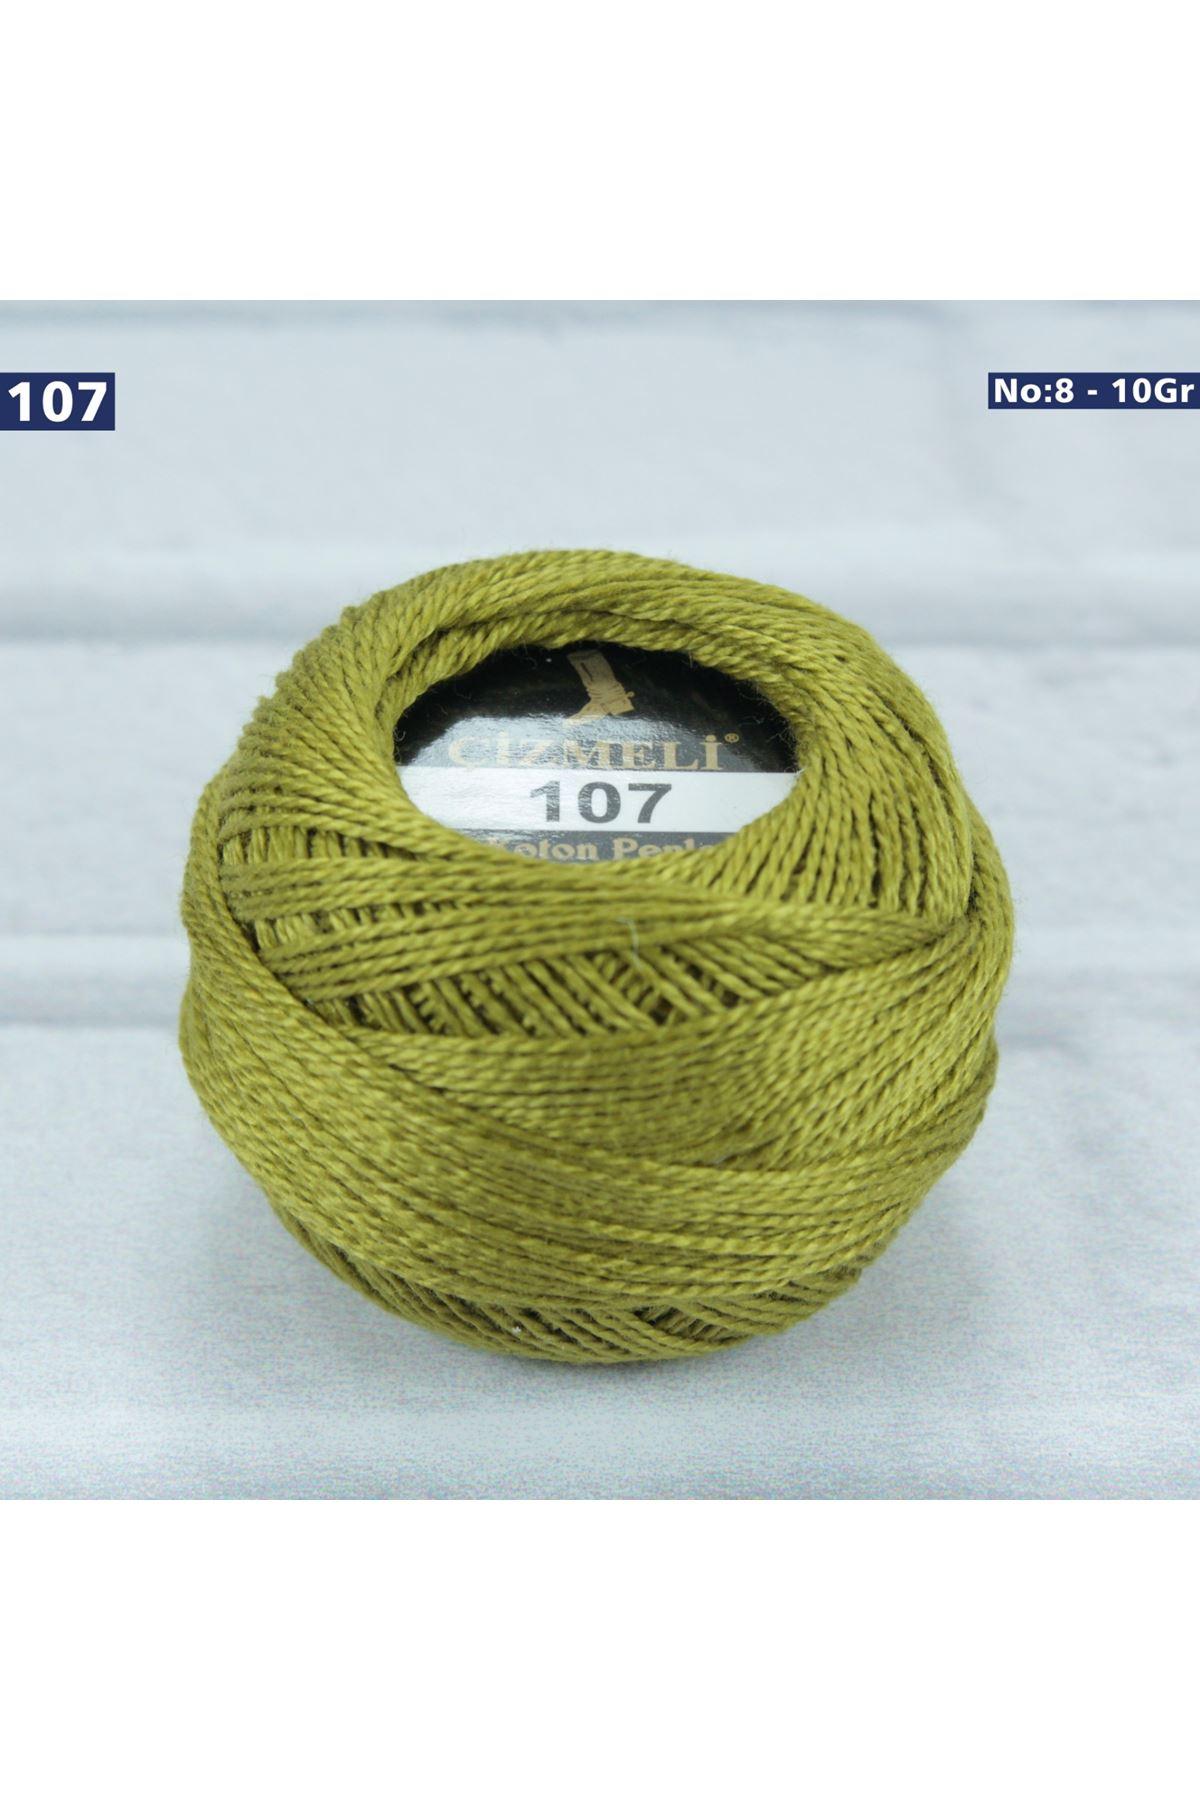 Çizmeli Cotton Perle Nakış İpliği No: 107